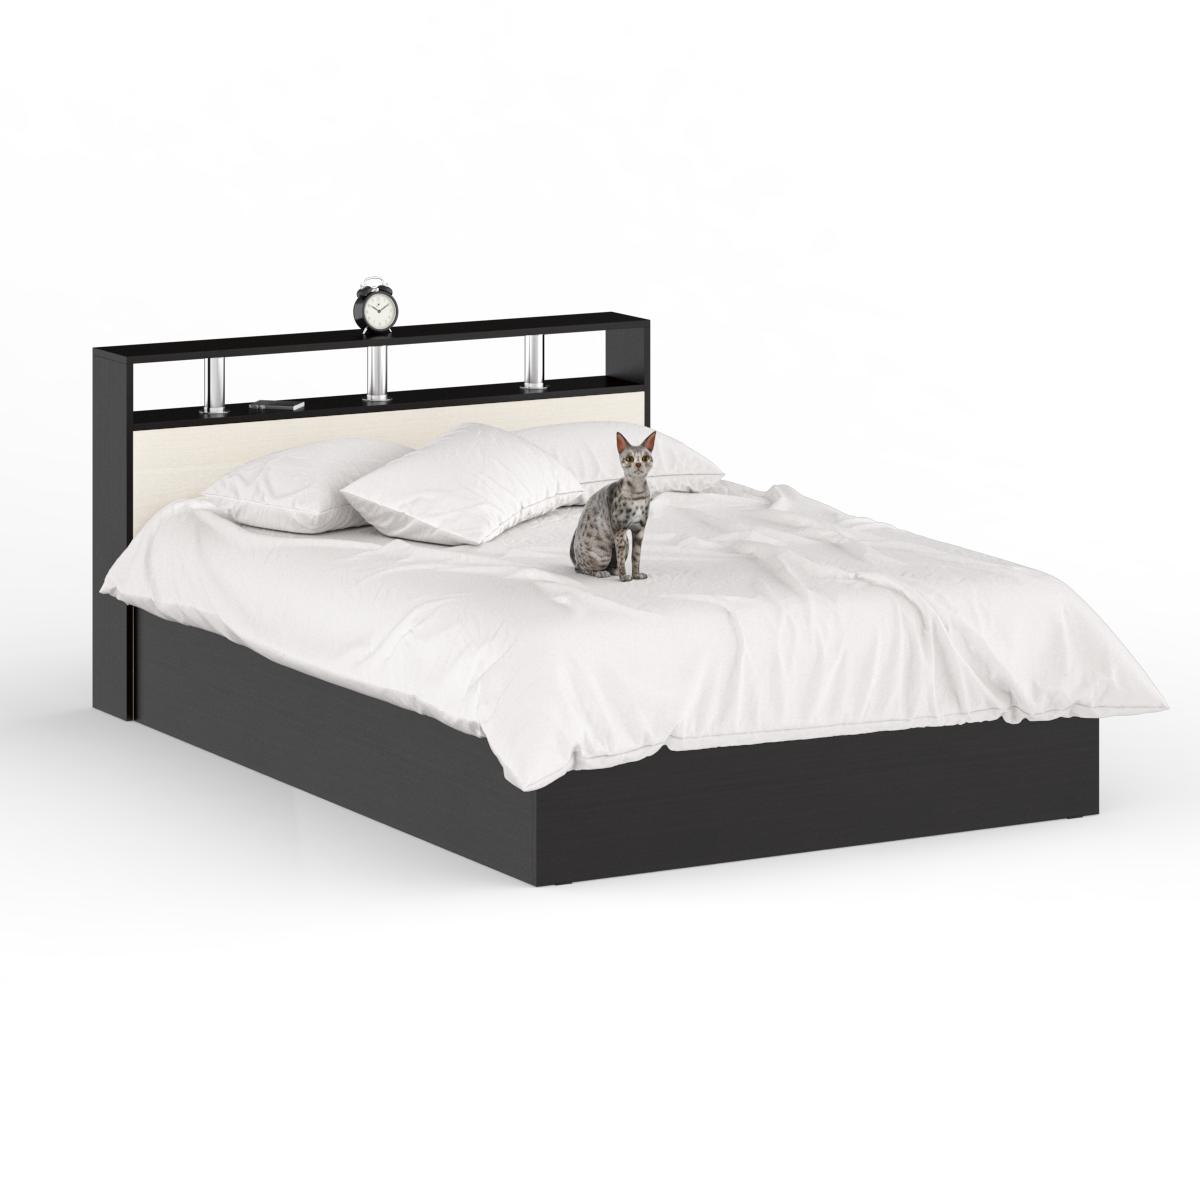 Кровать 1400 СВК Камелия венге/дуб лоредо, 143,5х203,5х88,2